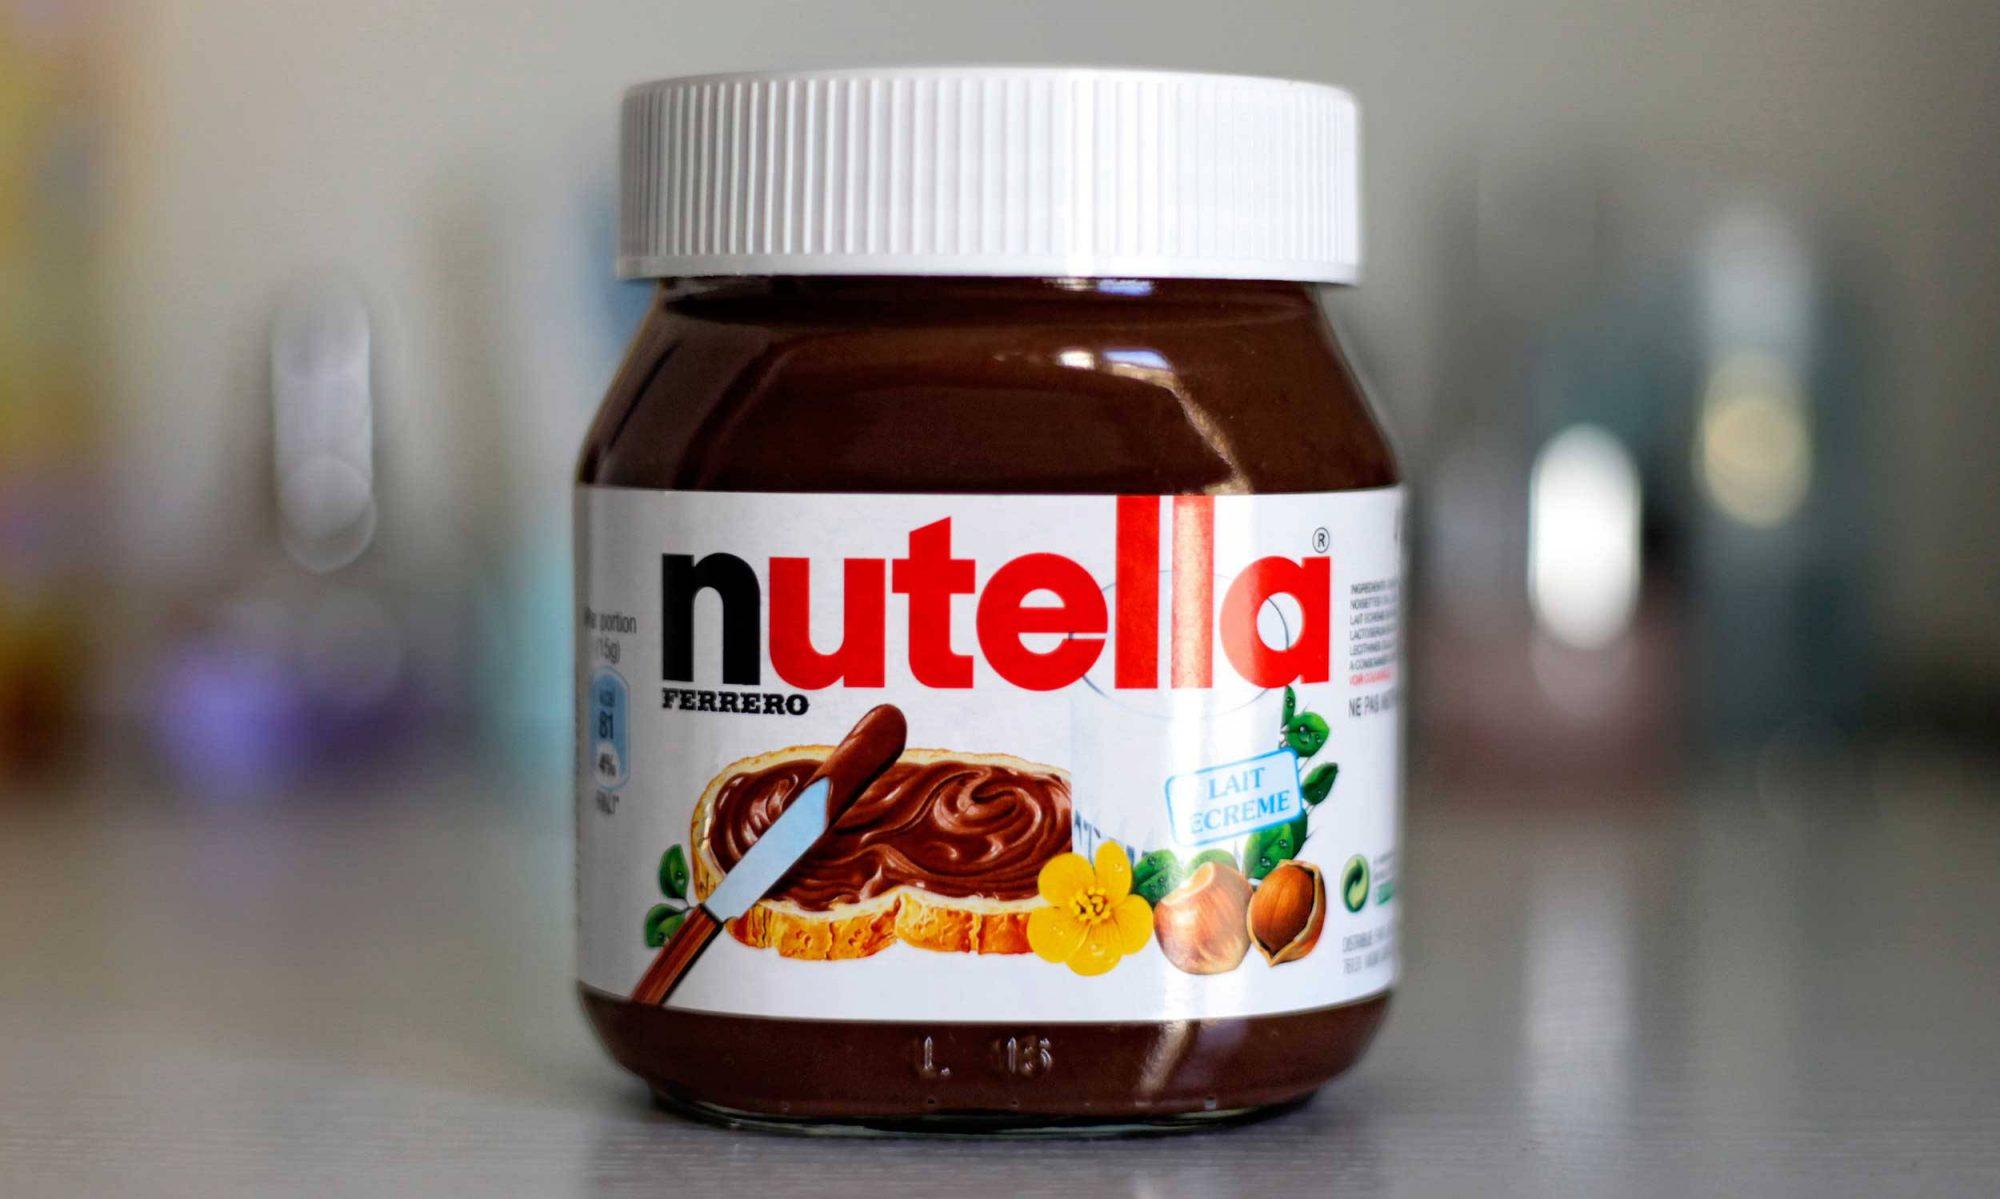 Closed jar of Nutella